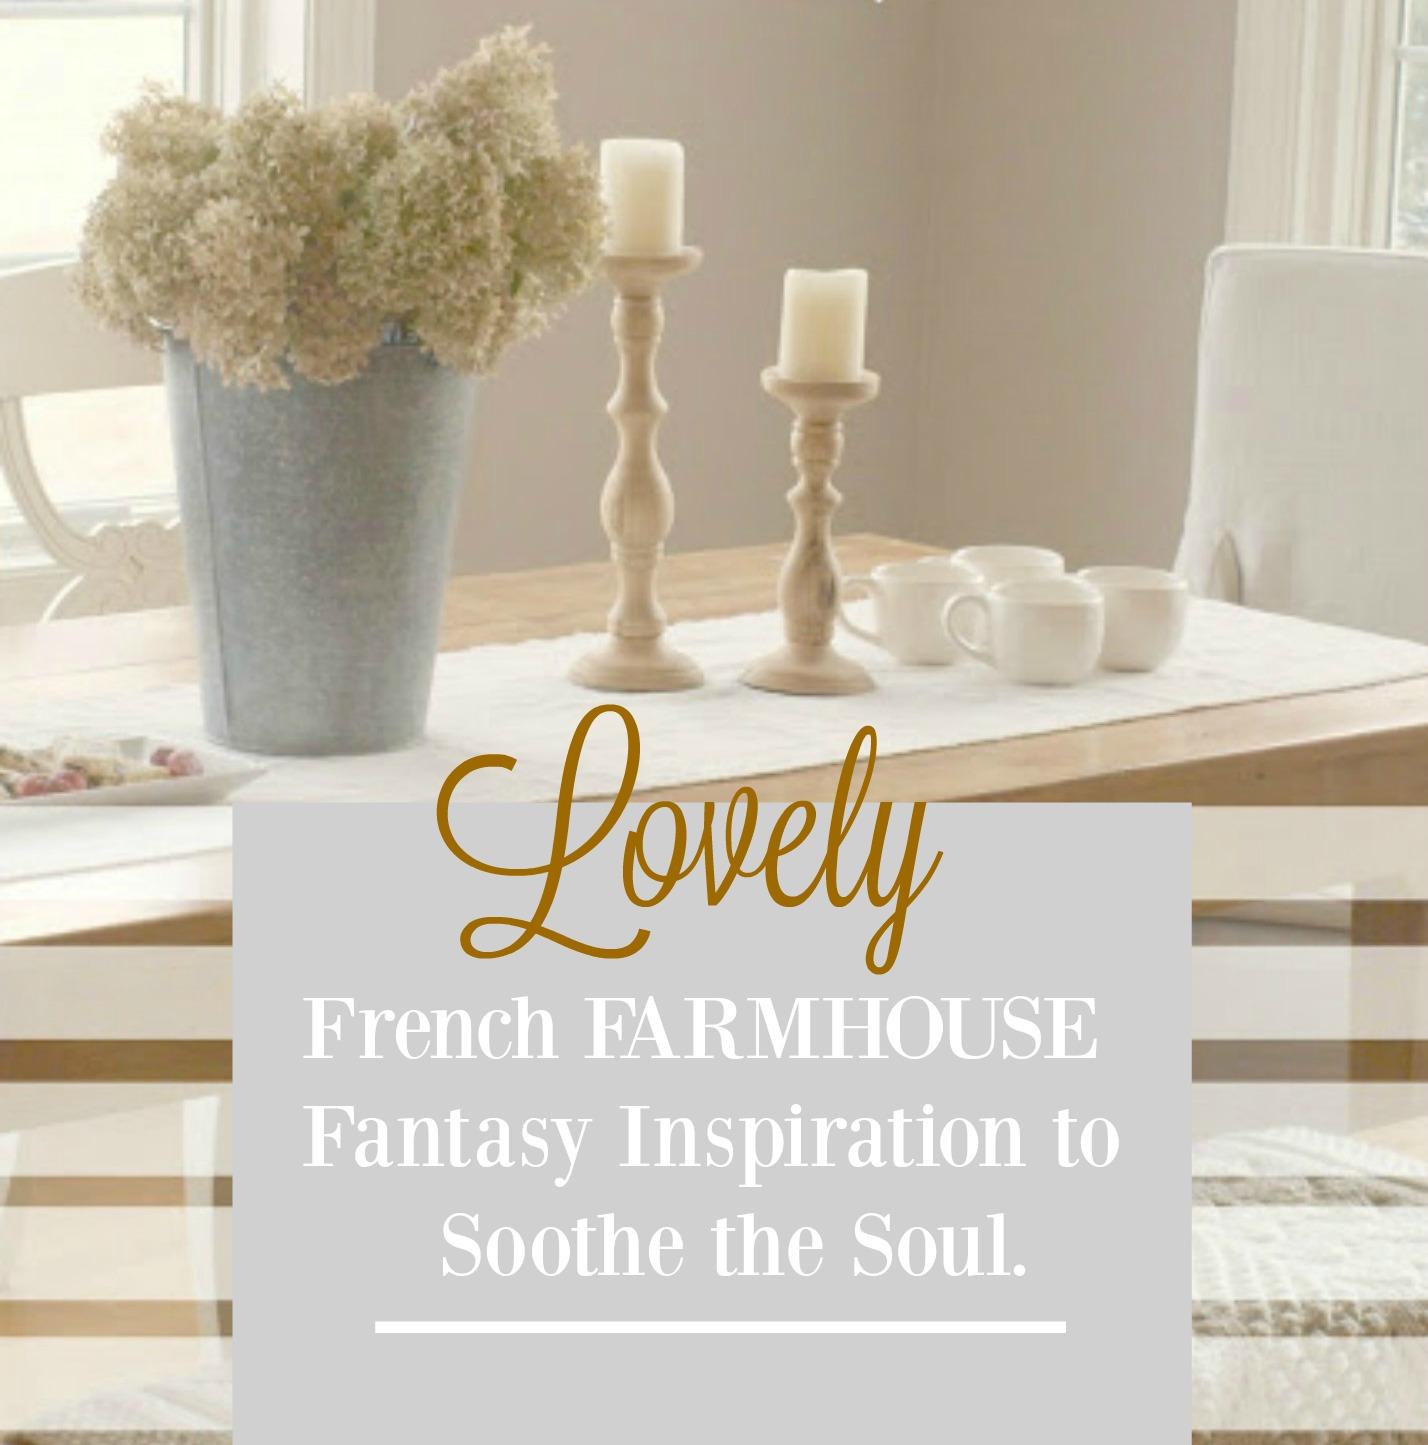 Lovely French Farmhouse Fantasy Inspiration to Sooth the Soul #frenchfarmhouse #frenchcountry #farmhousedecor